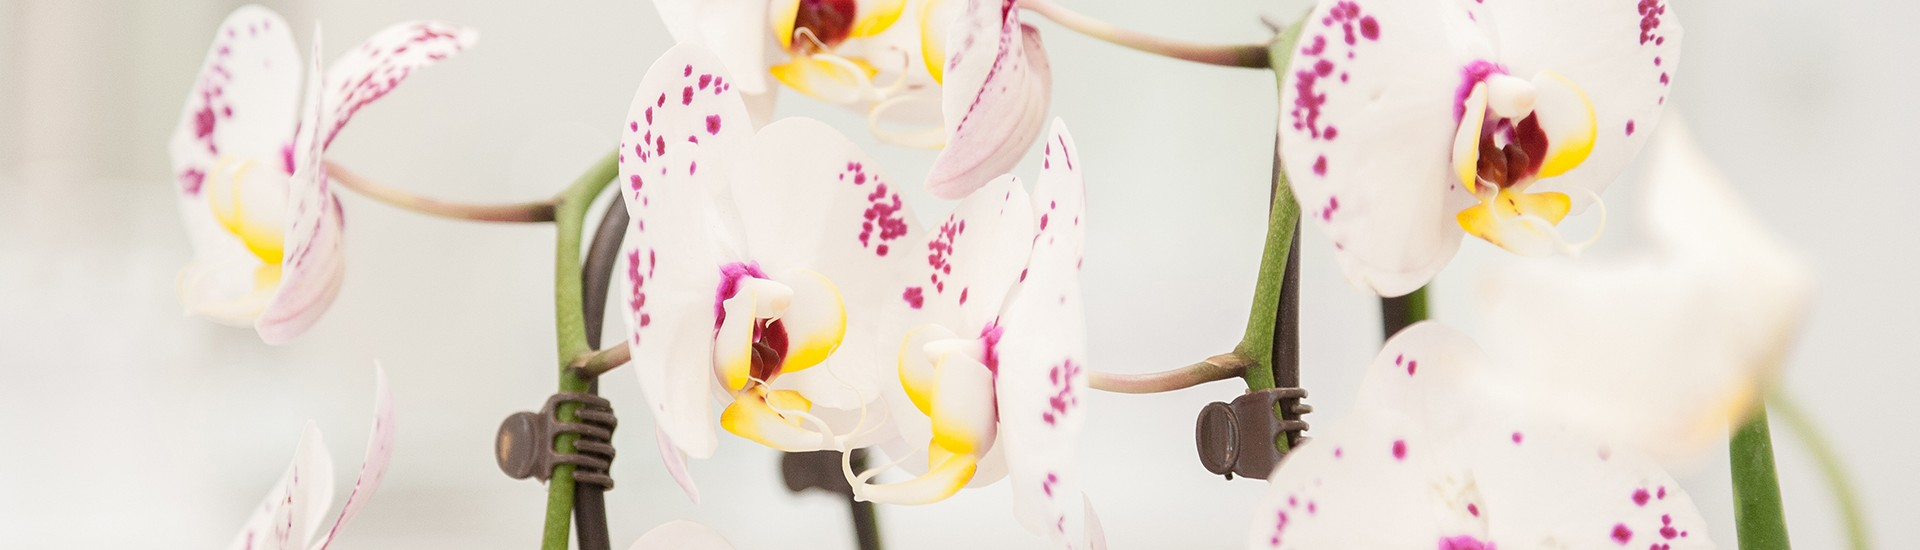 Kbal-hairstylist-Kapsalon-Amsterdam-flowers